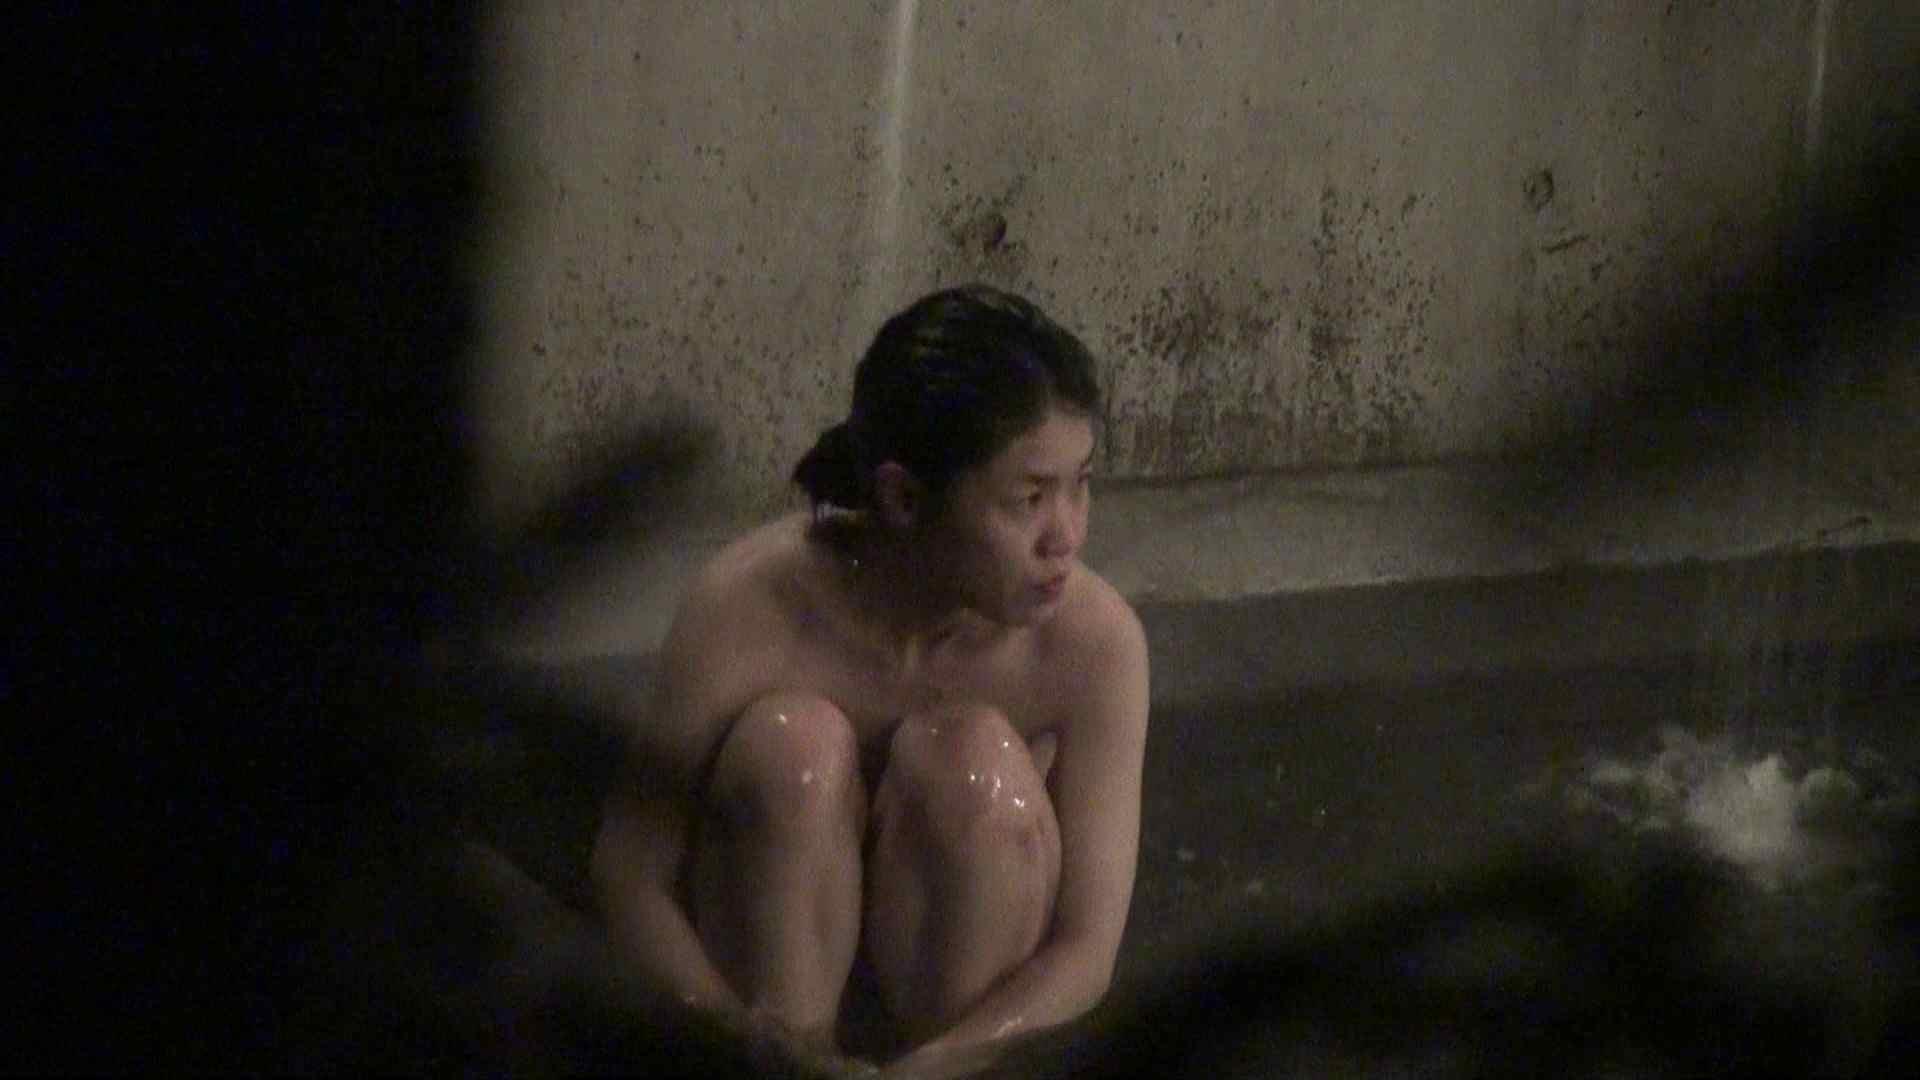 Aquaな露天風呂Vol.409 盗撮 すけべAV動画紹介 85枚 83